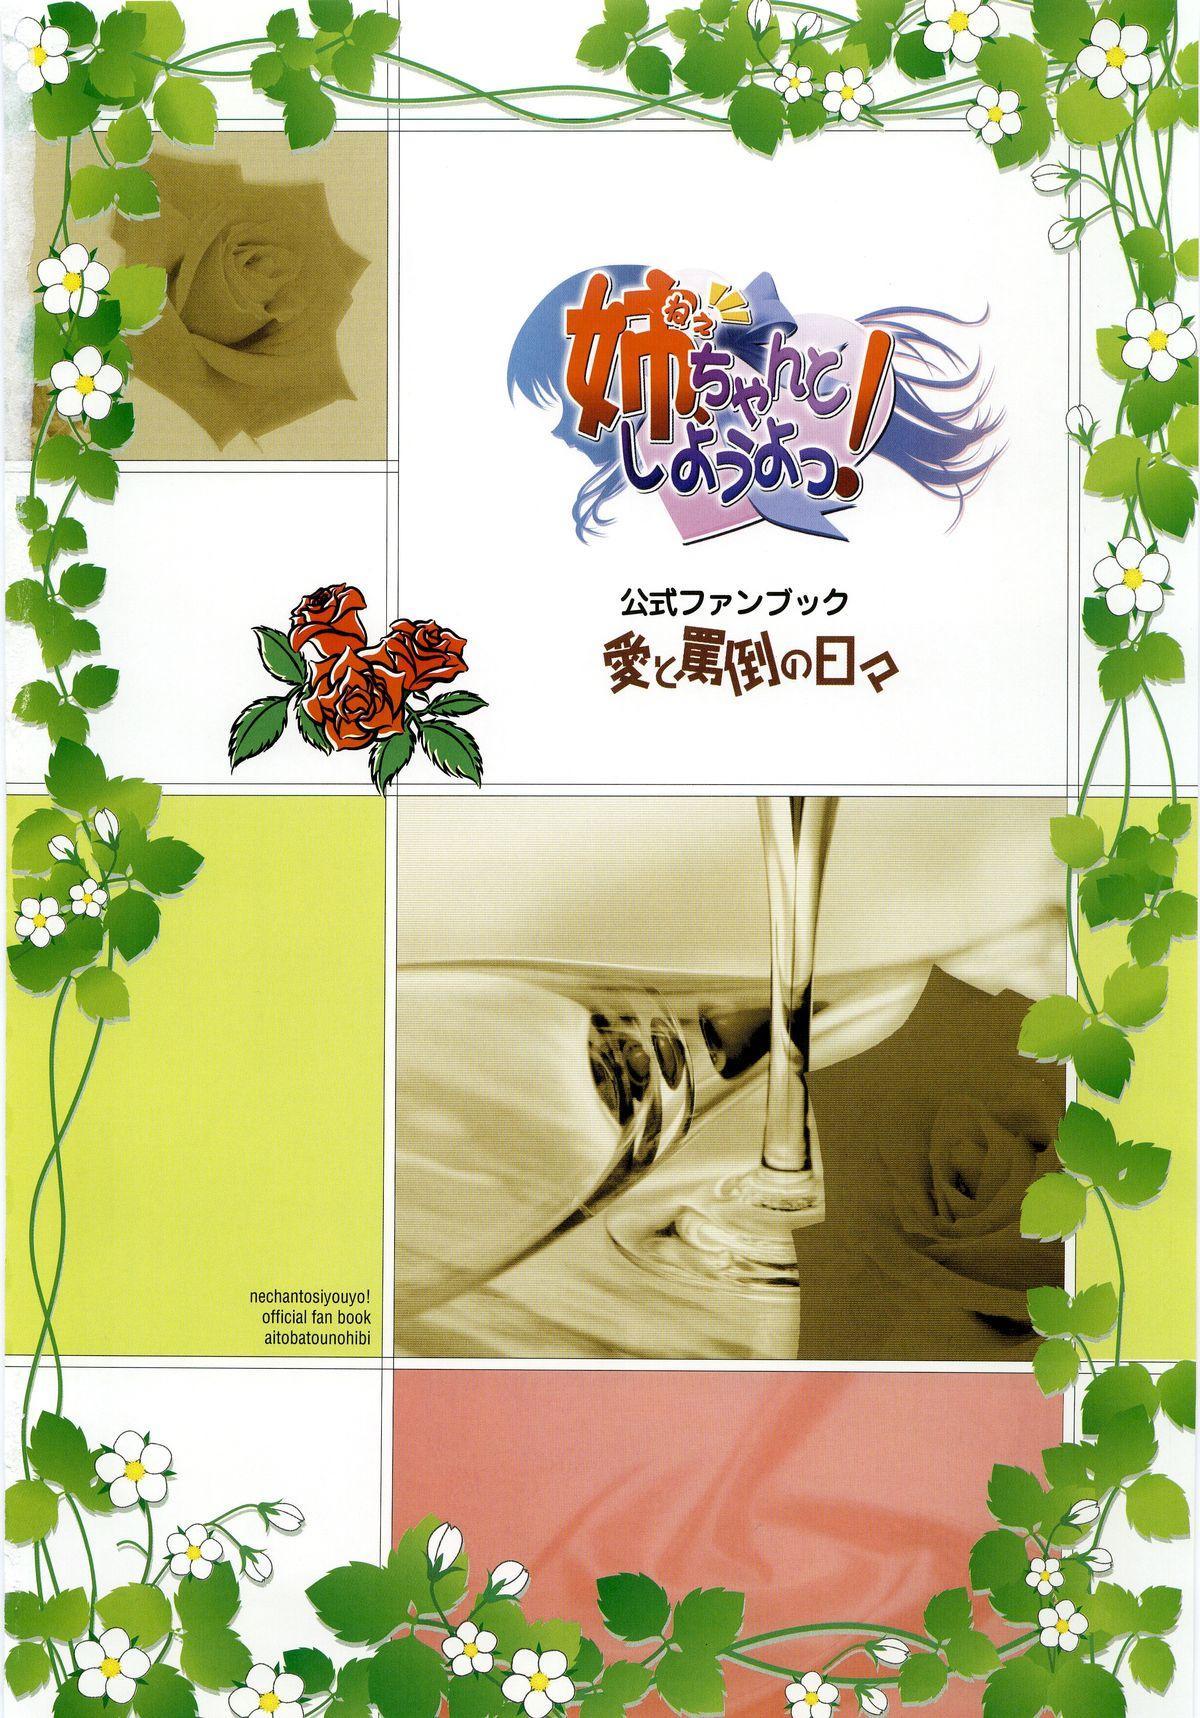 Nee, Chan to Shiyou yo! Koushiki Fanbook - Ai to Batou no Hibi 0